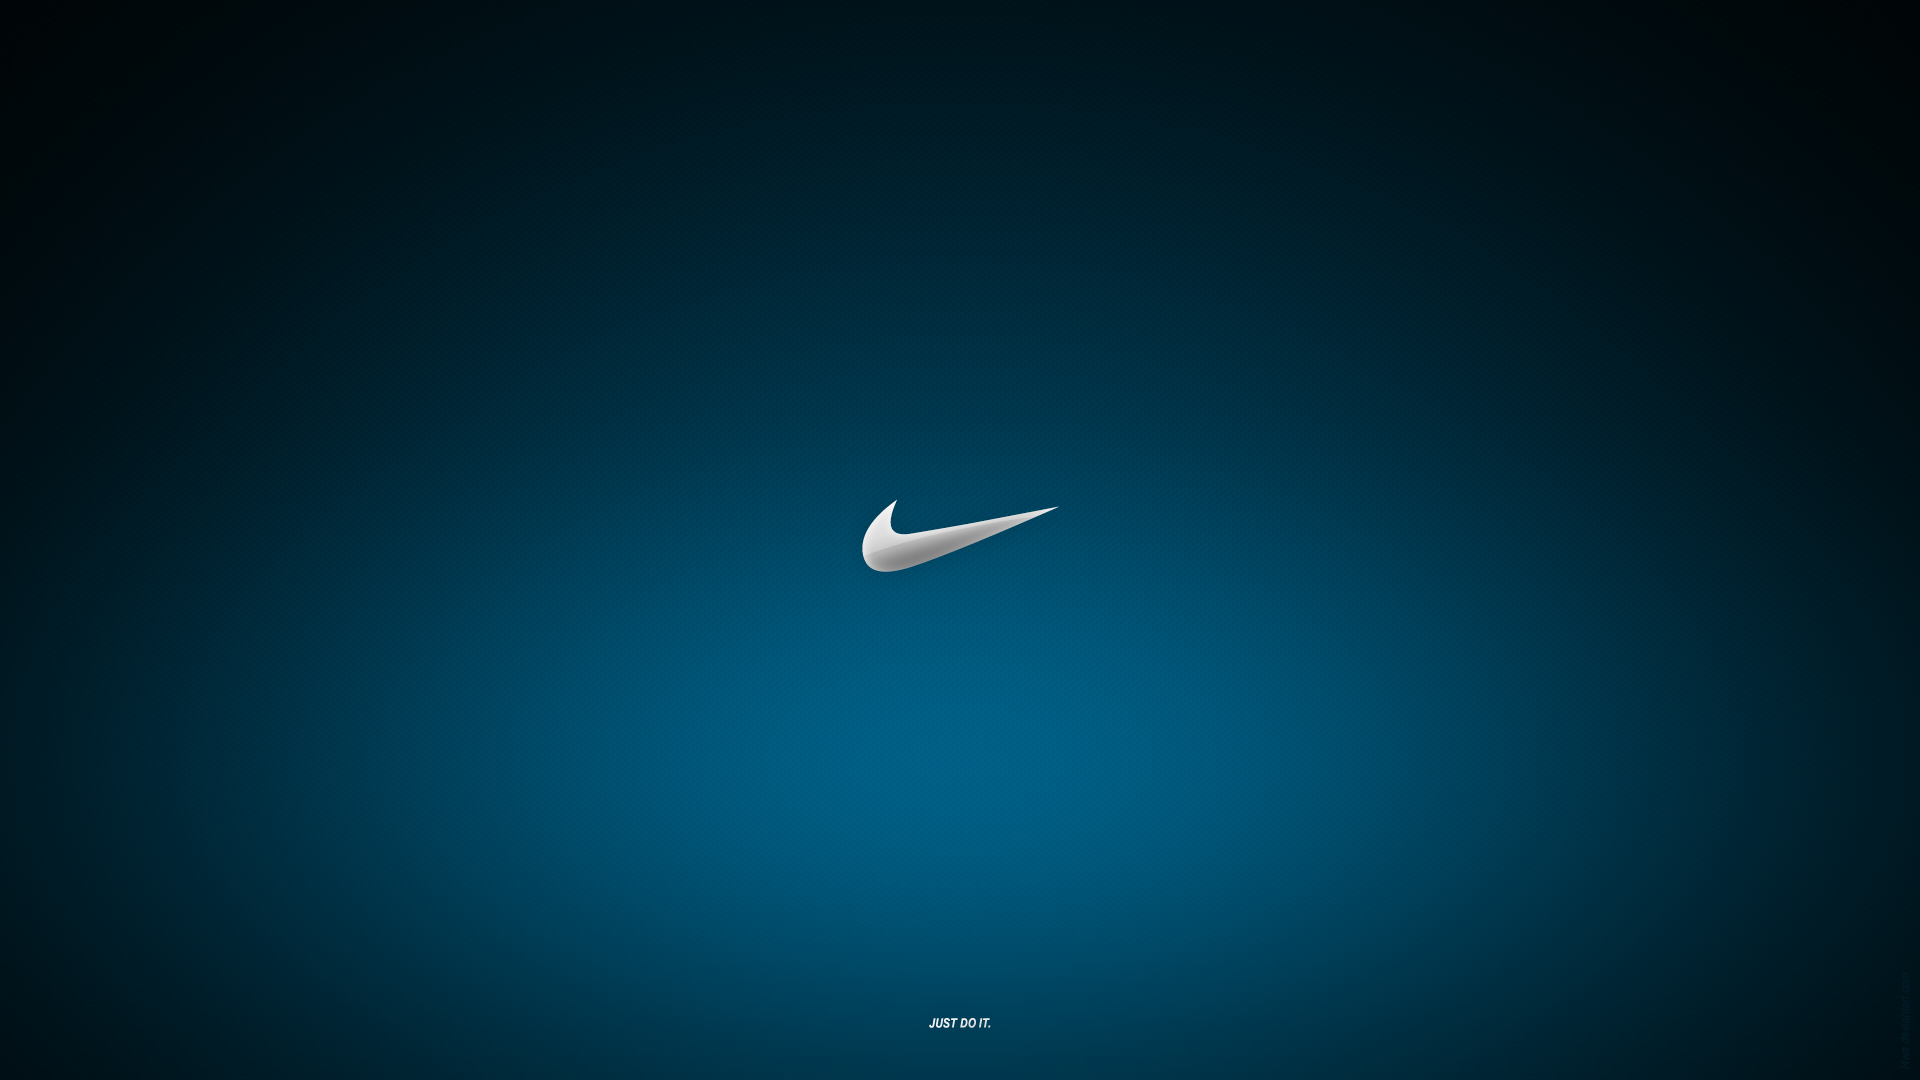 Hd wallpaper cool - Cool Nike Logo Wallpaper Hd Hd Wallpaperia